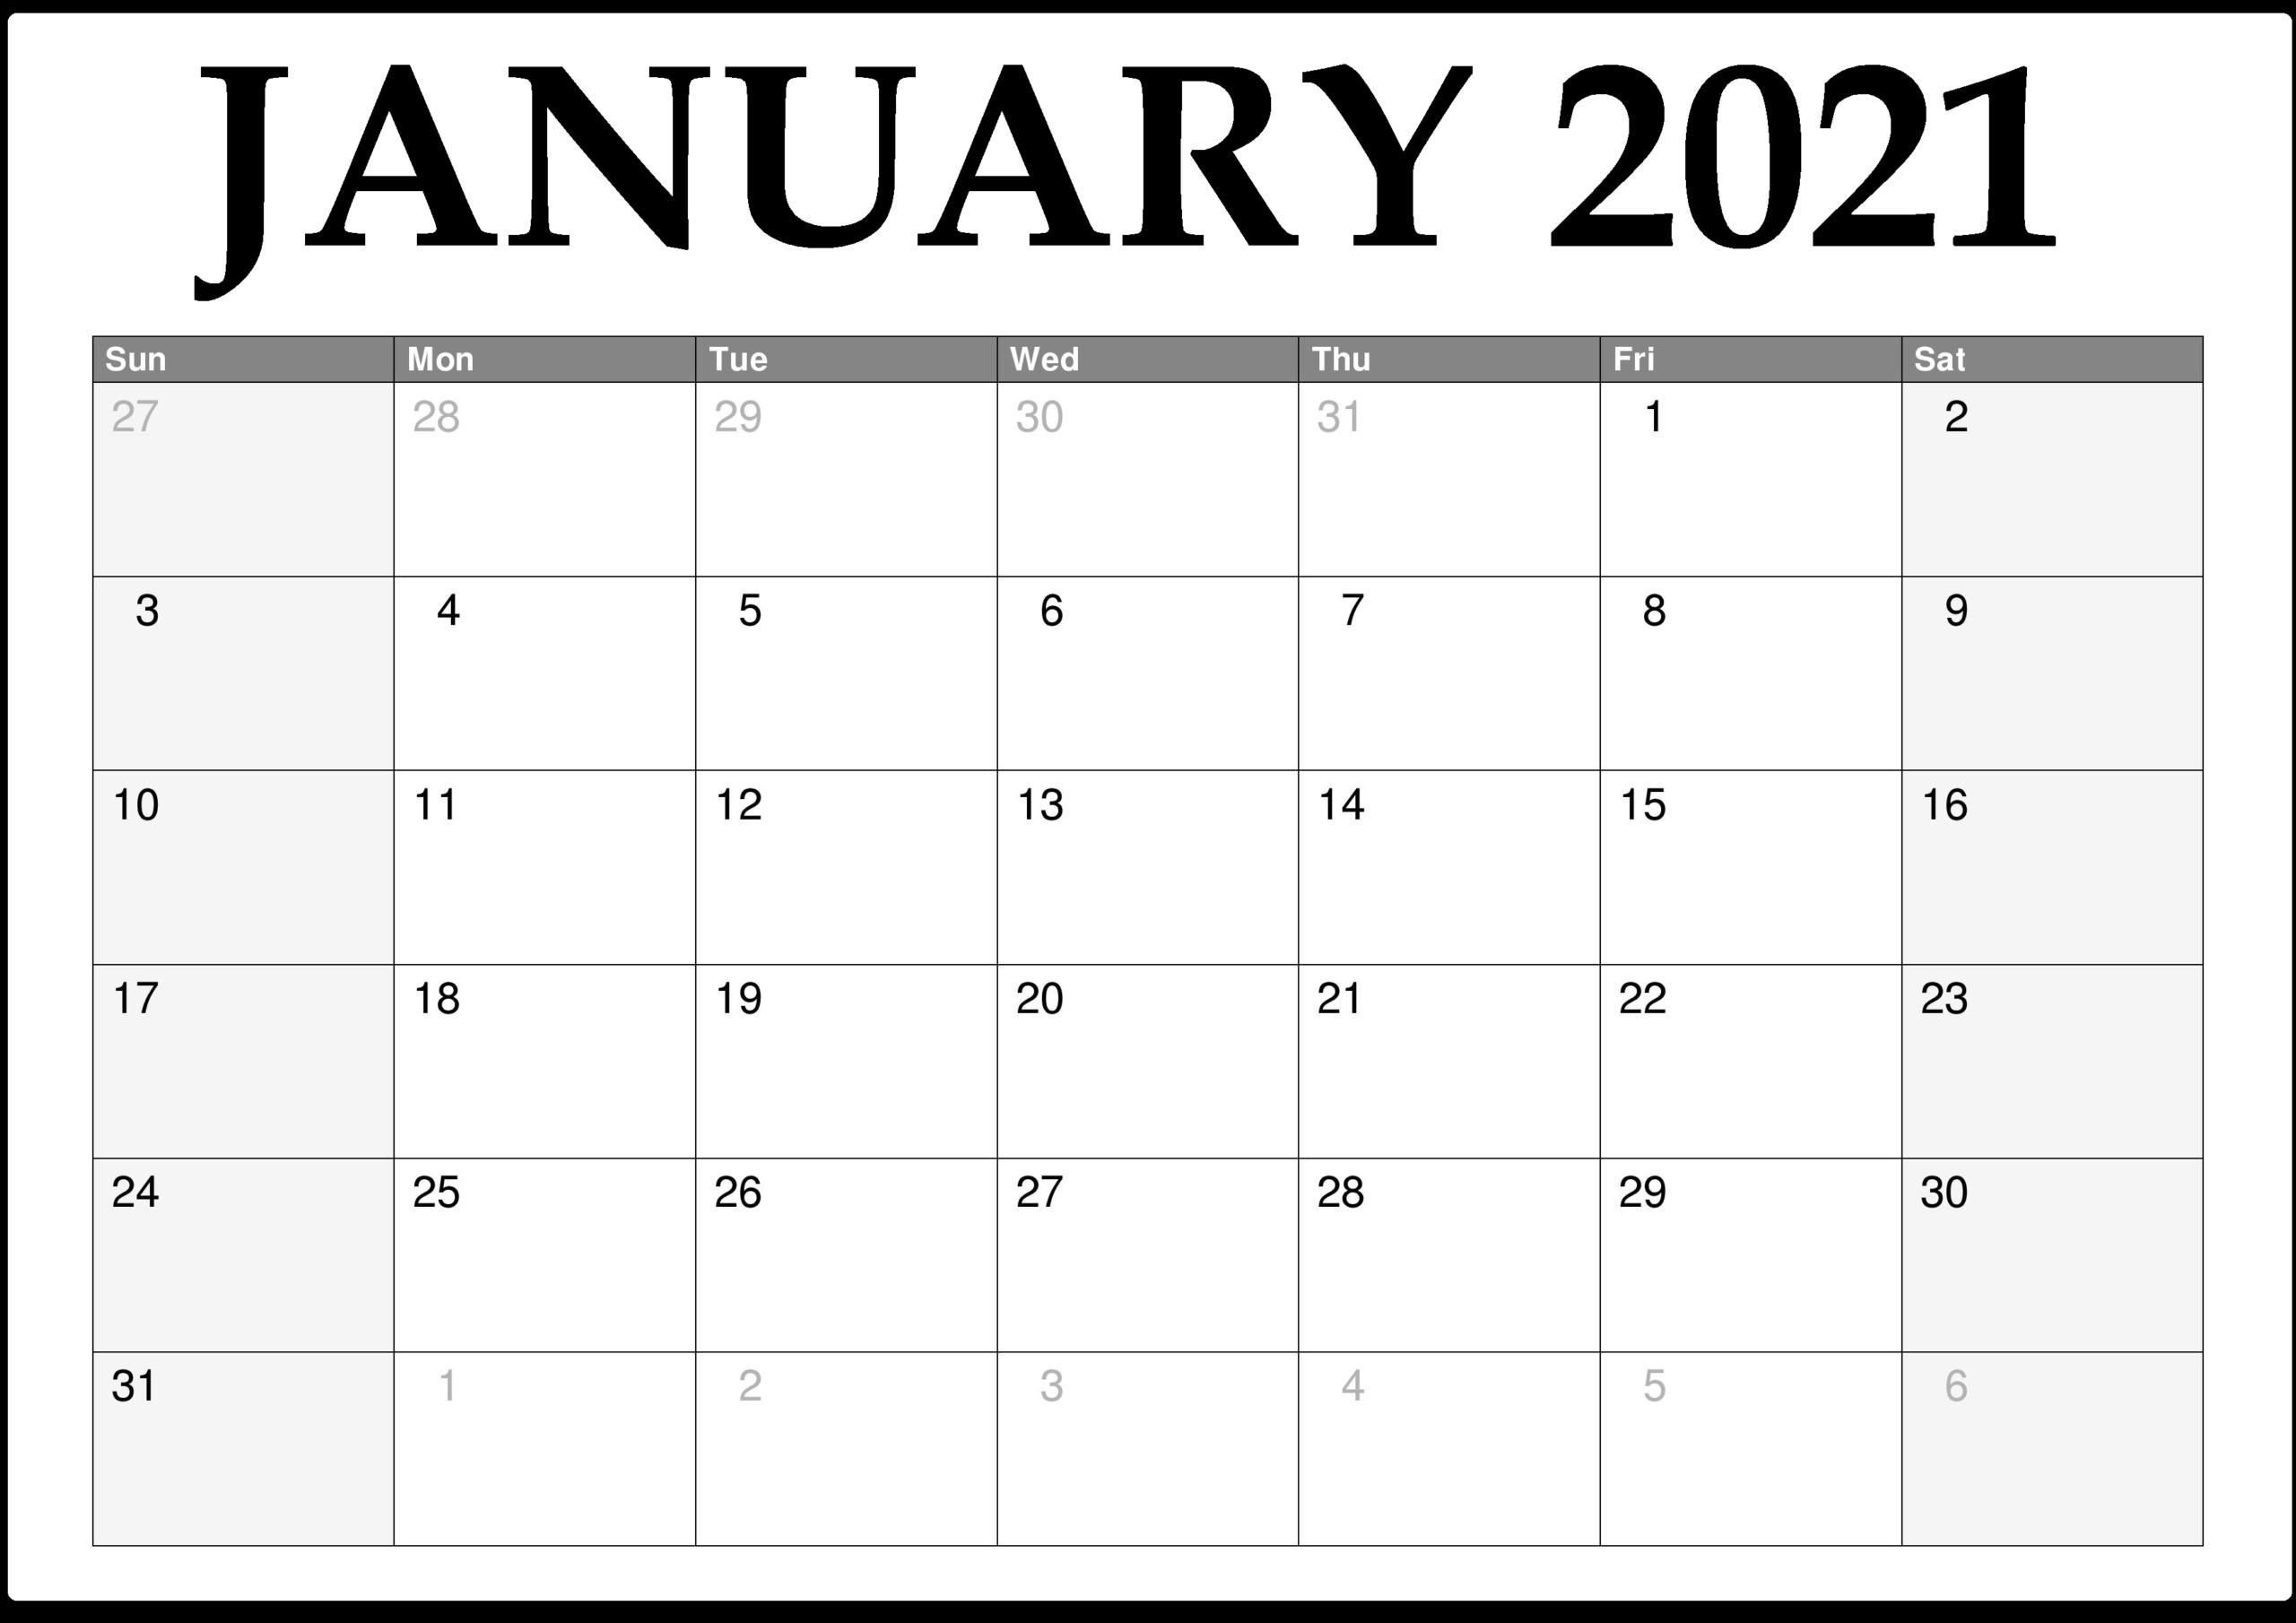 Free Printable January 2021 Calendar With Holidays - Free Printable Blank Holidays Calendar